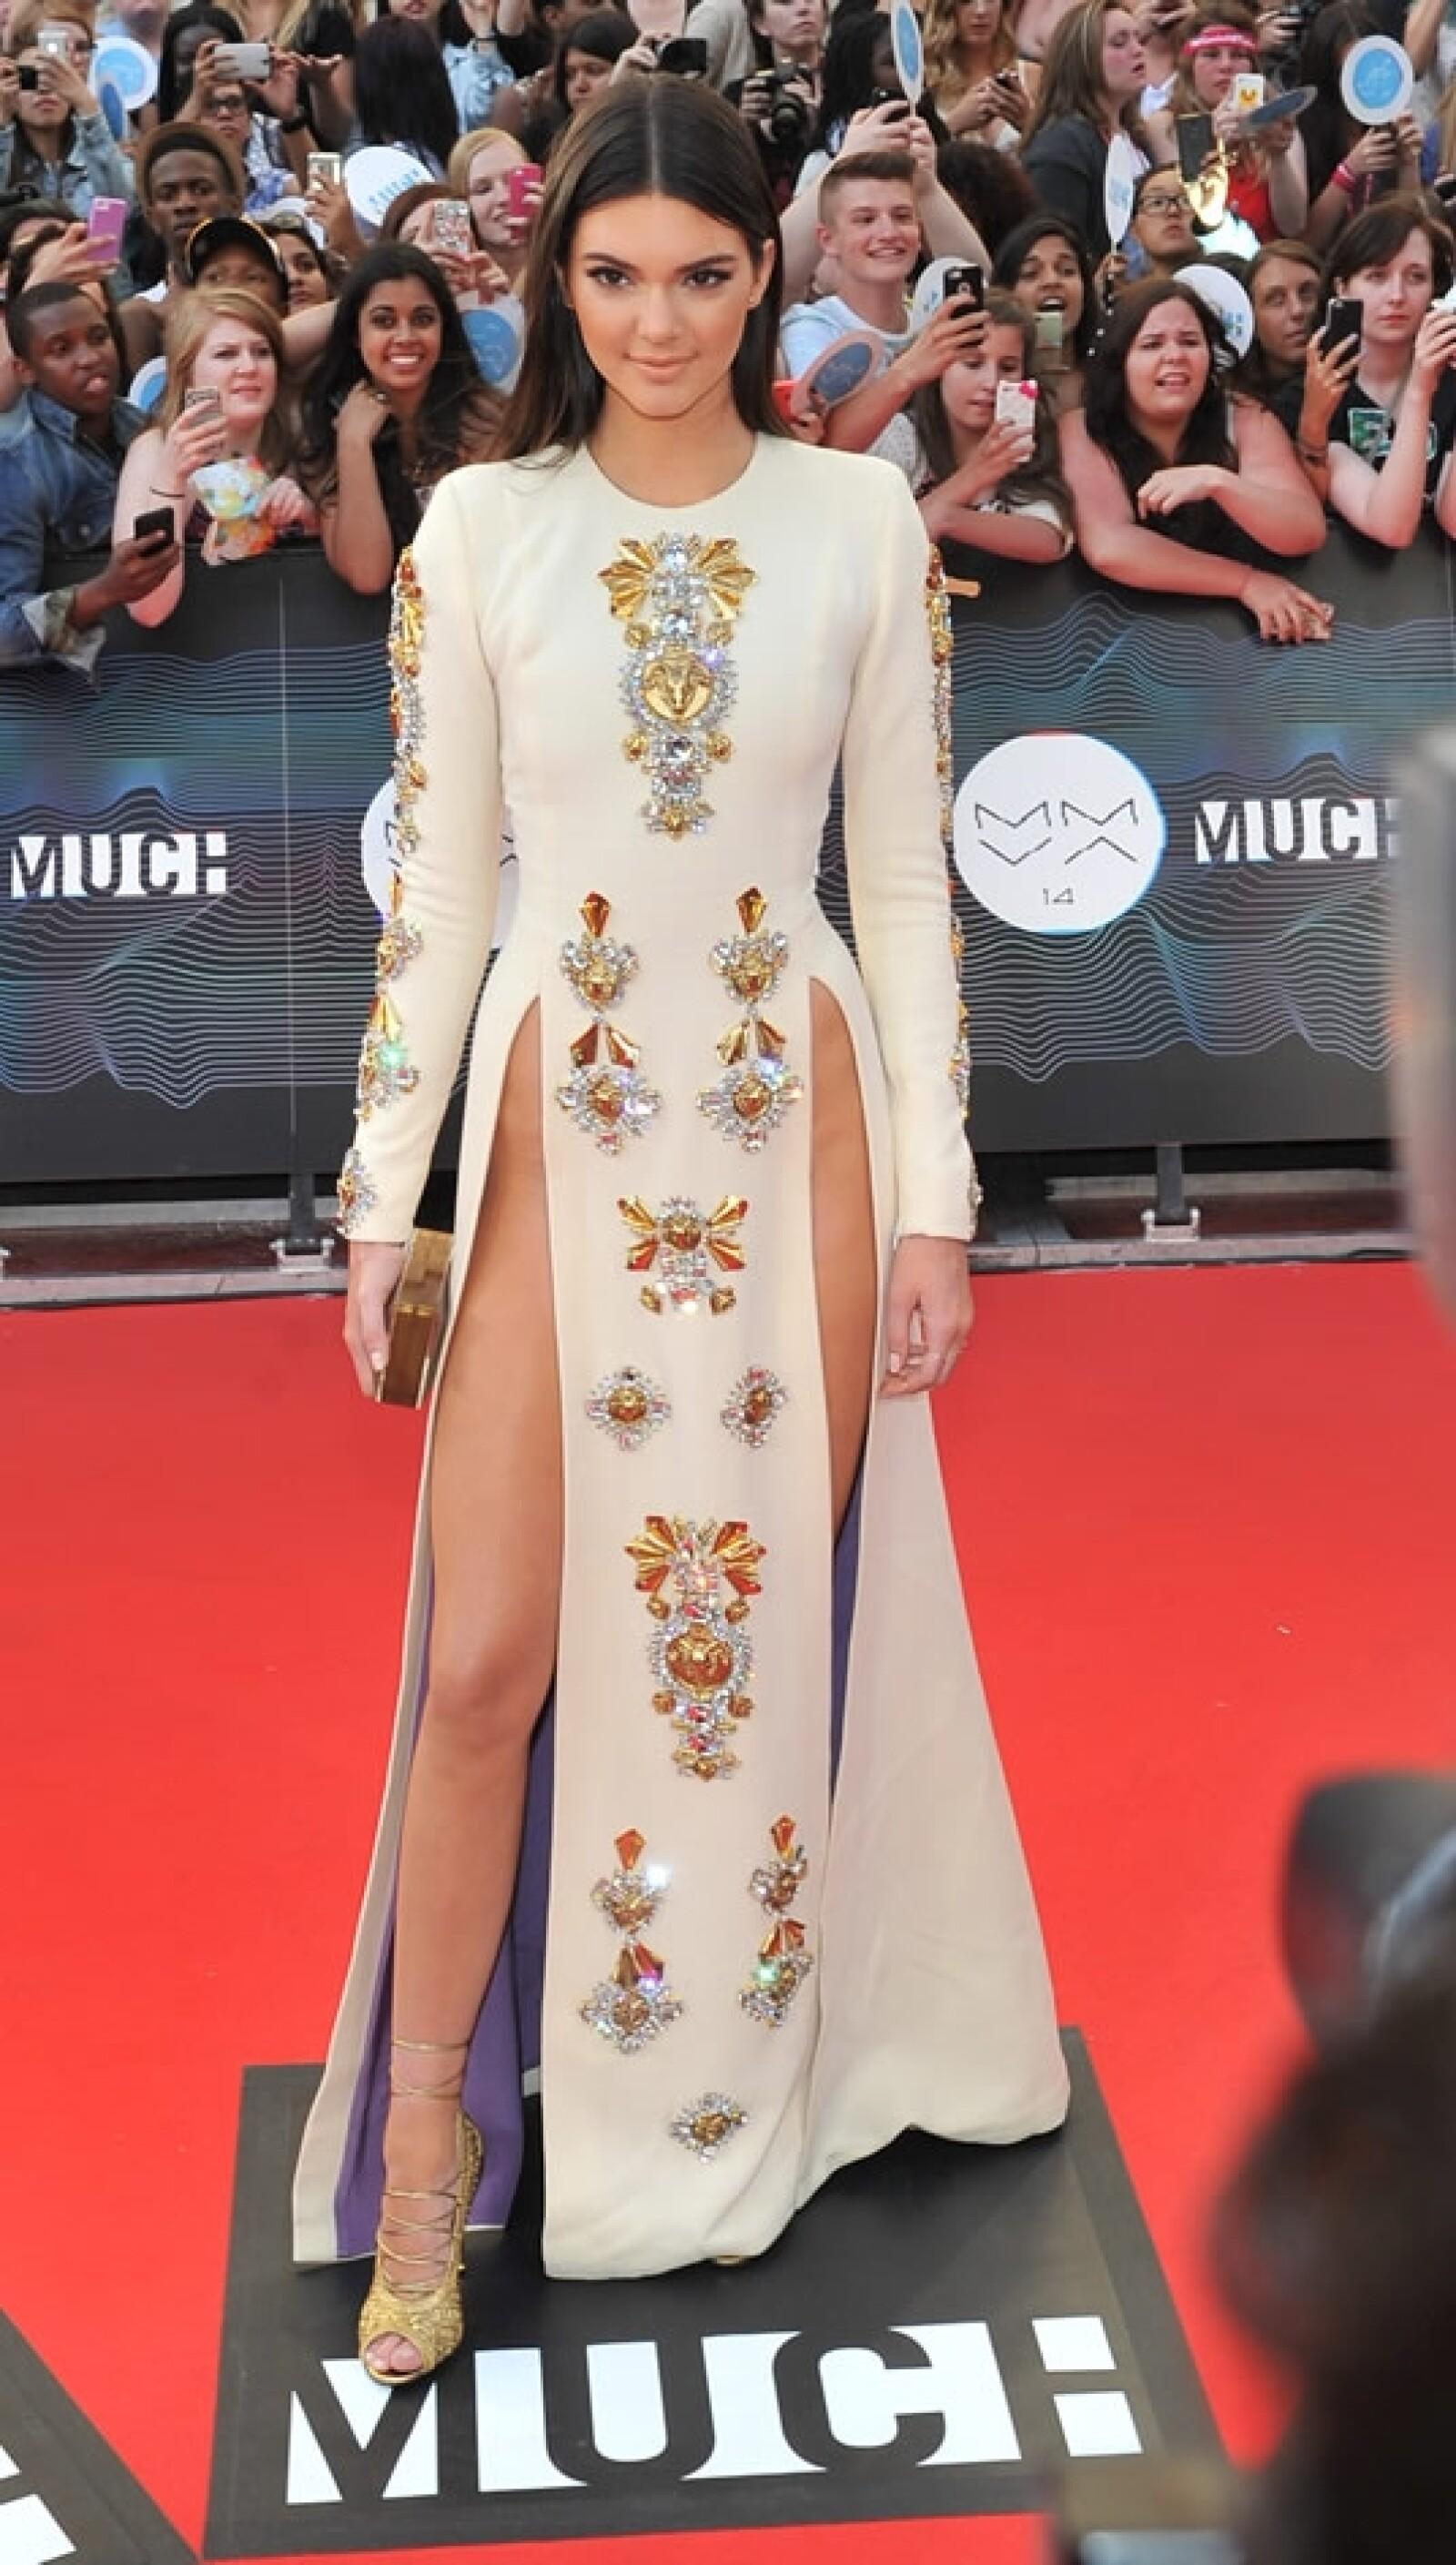 Kendall Jenner premios MuchMusic